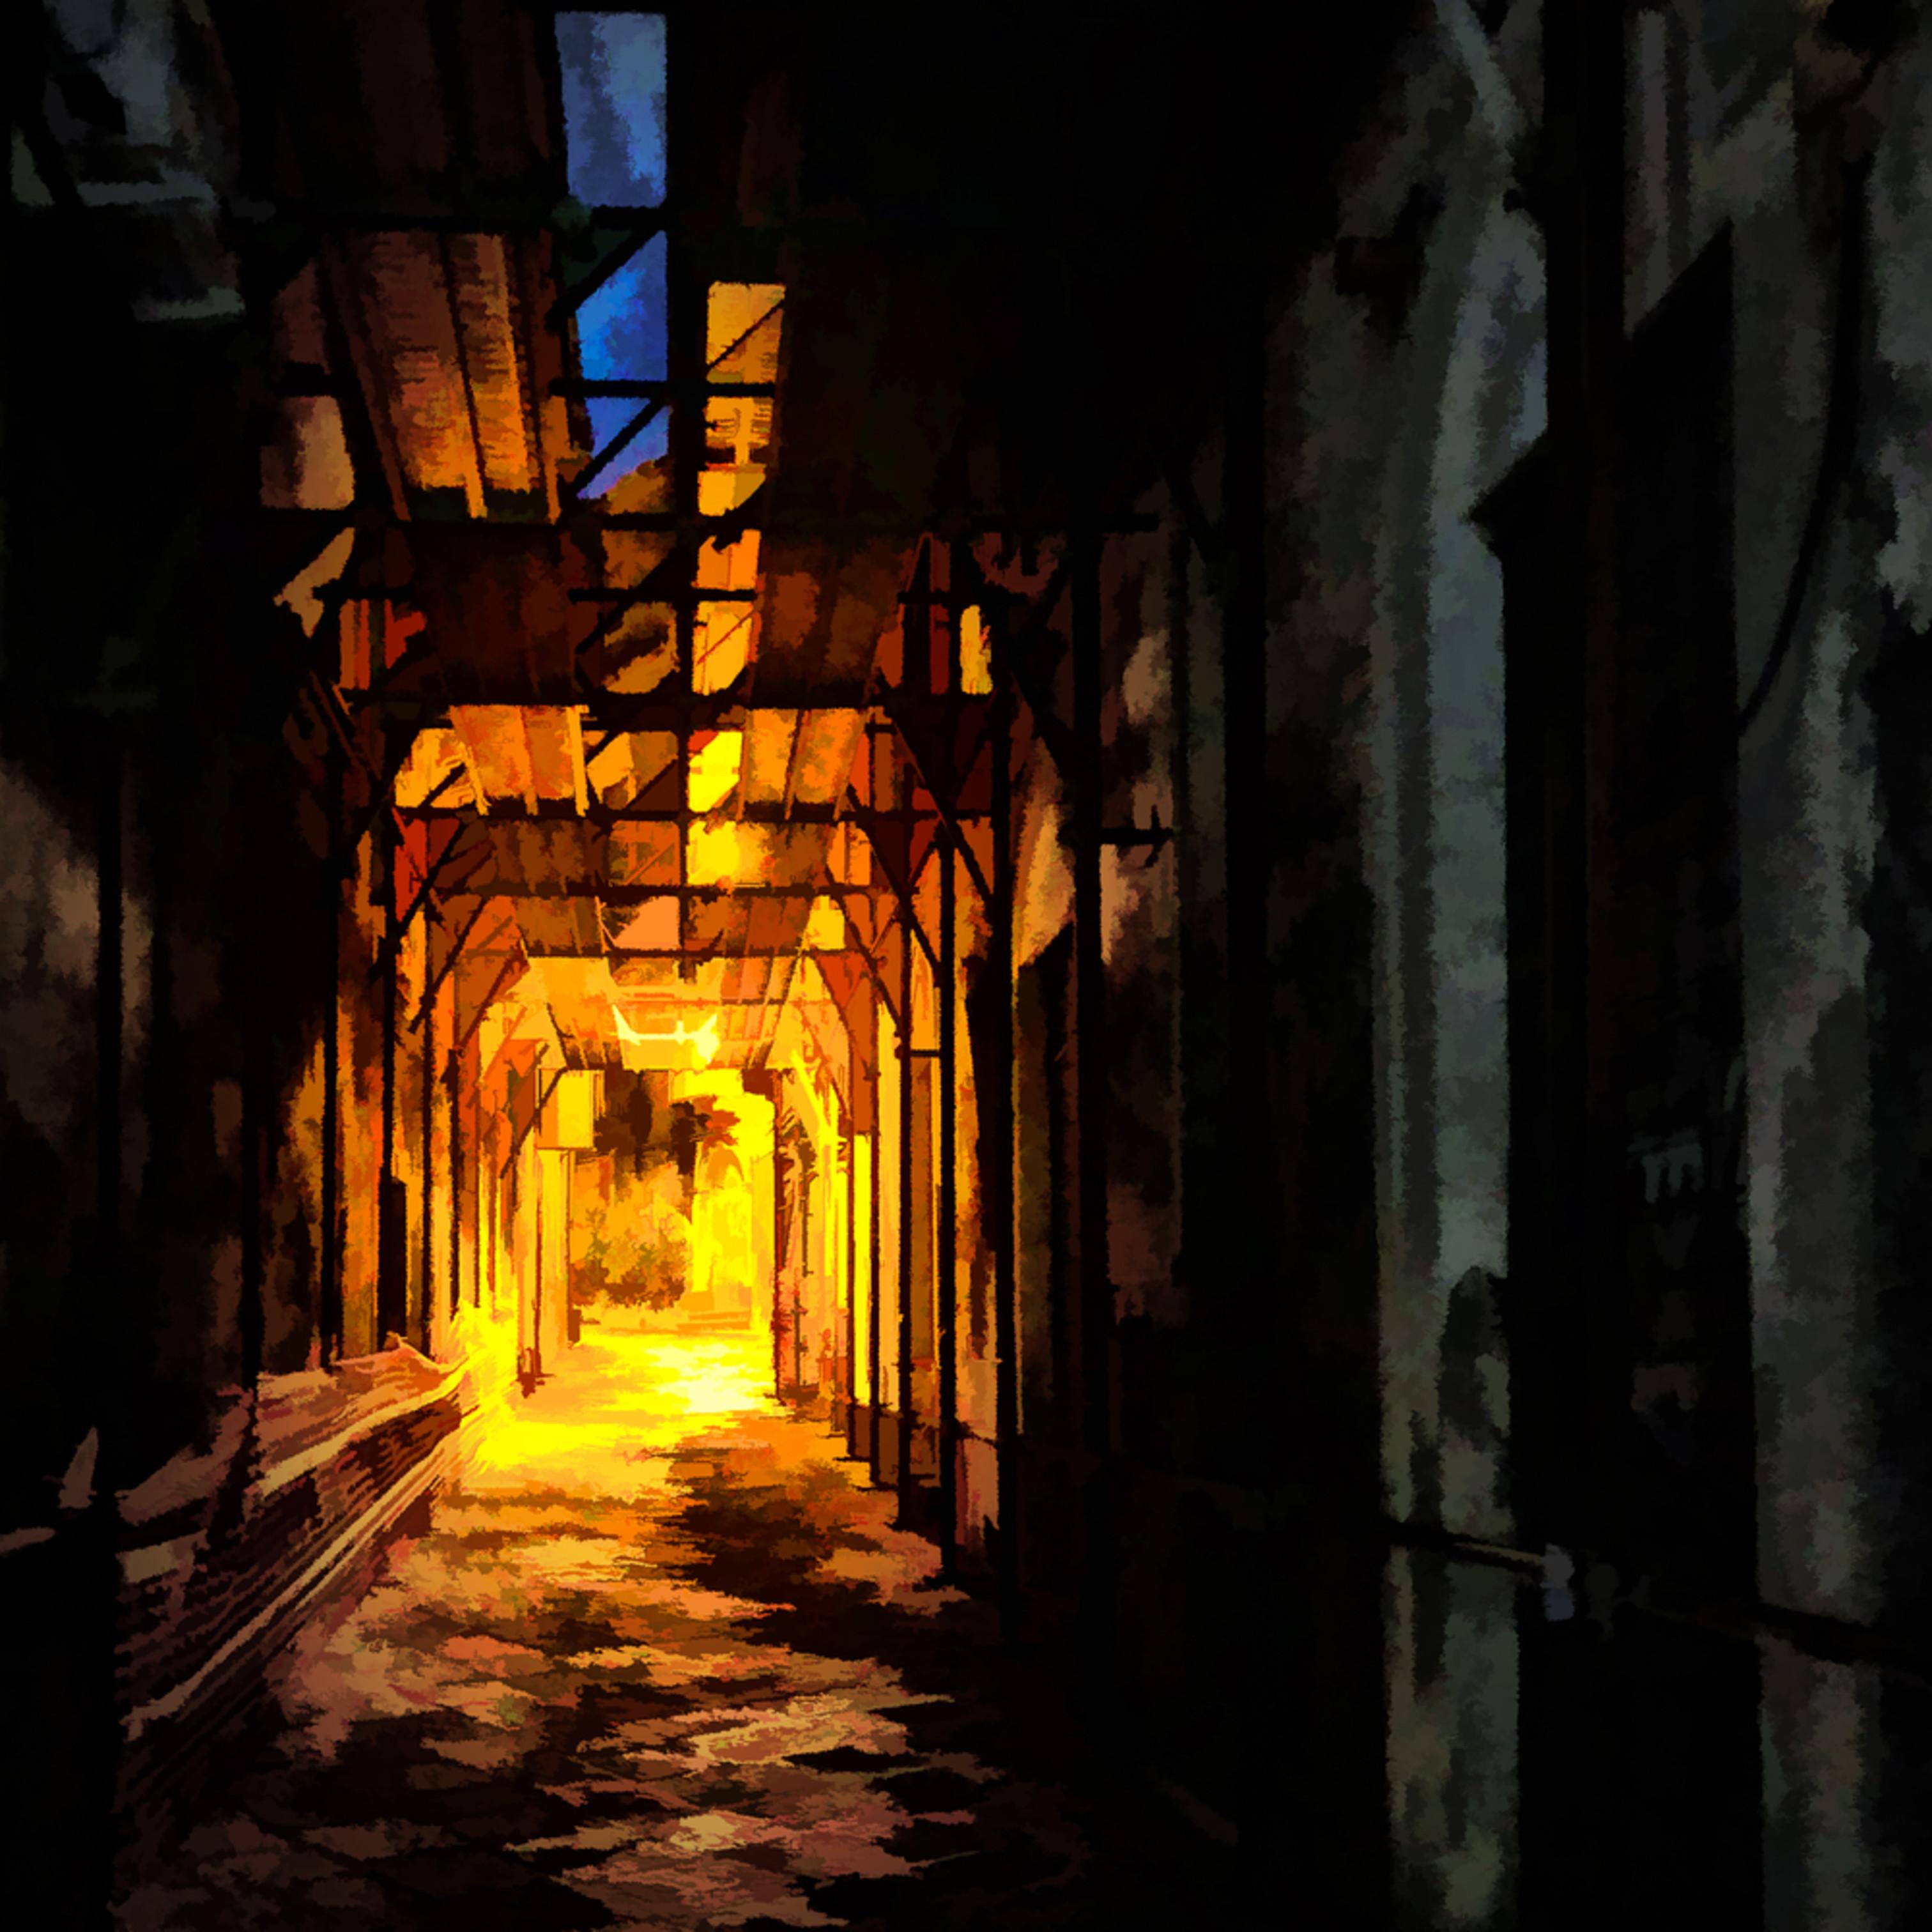 Dante s alley  au9bcj